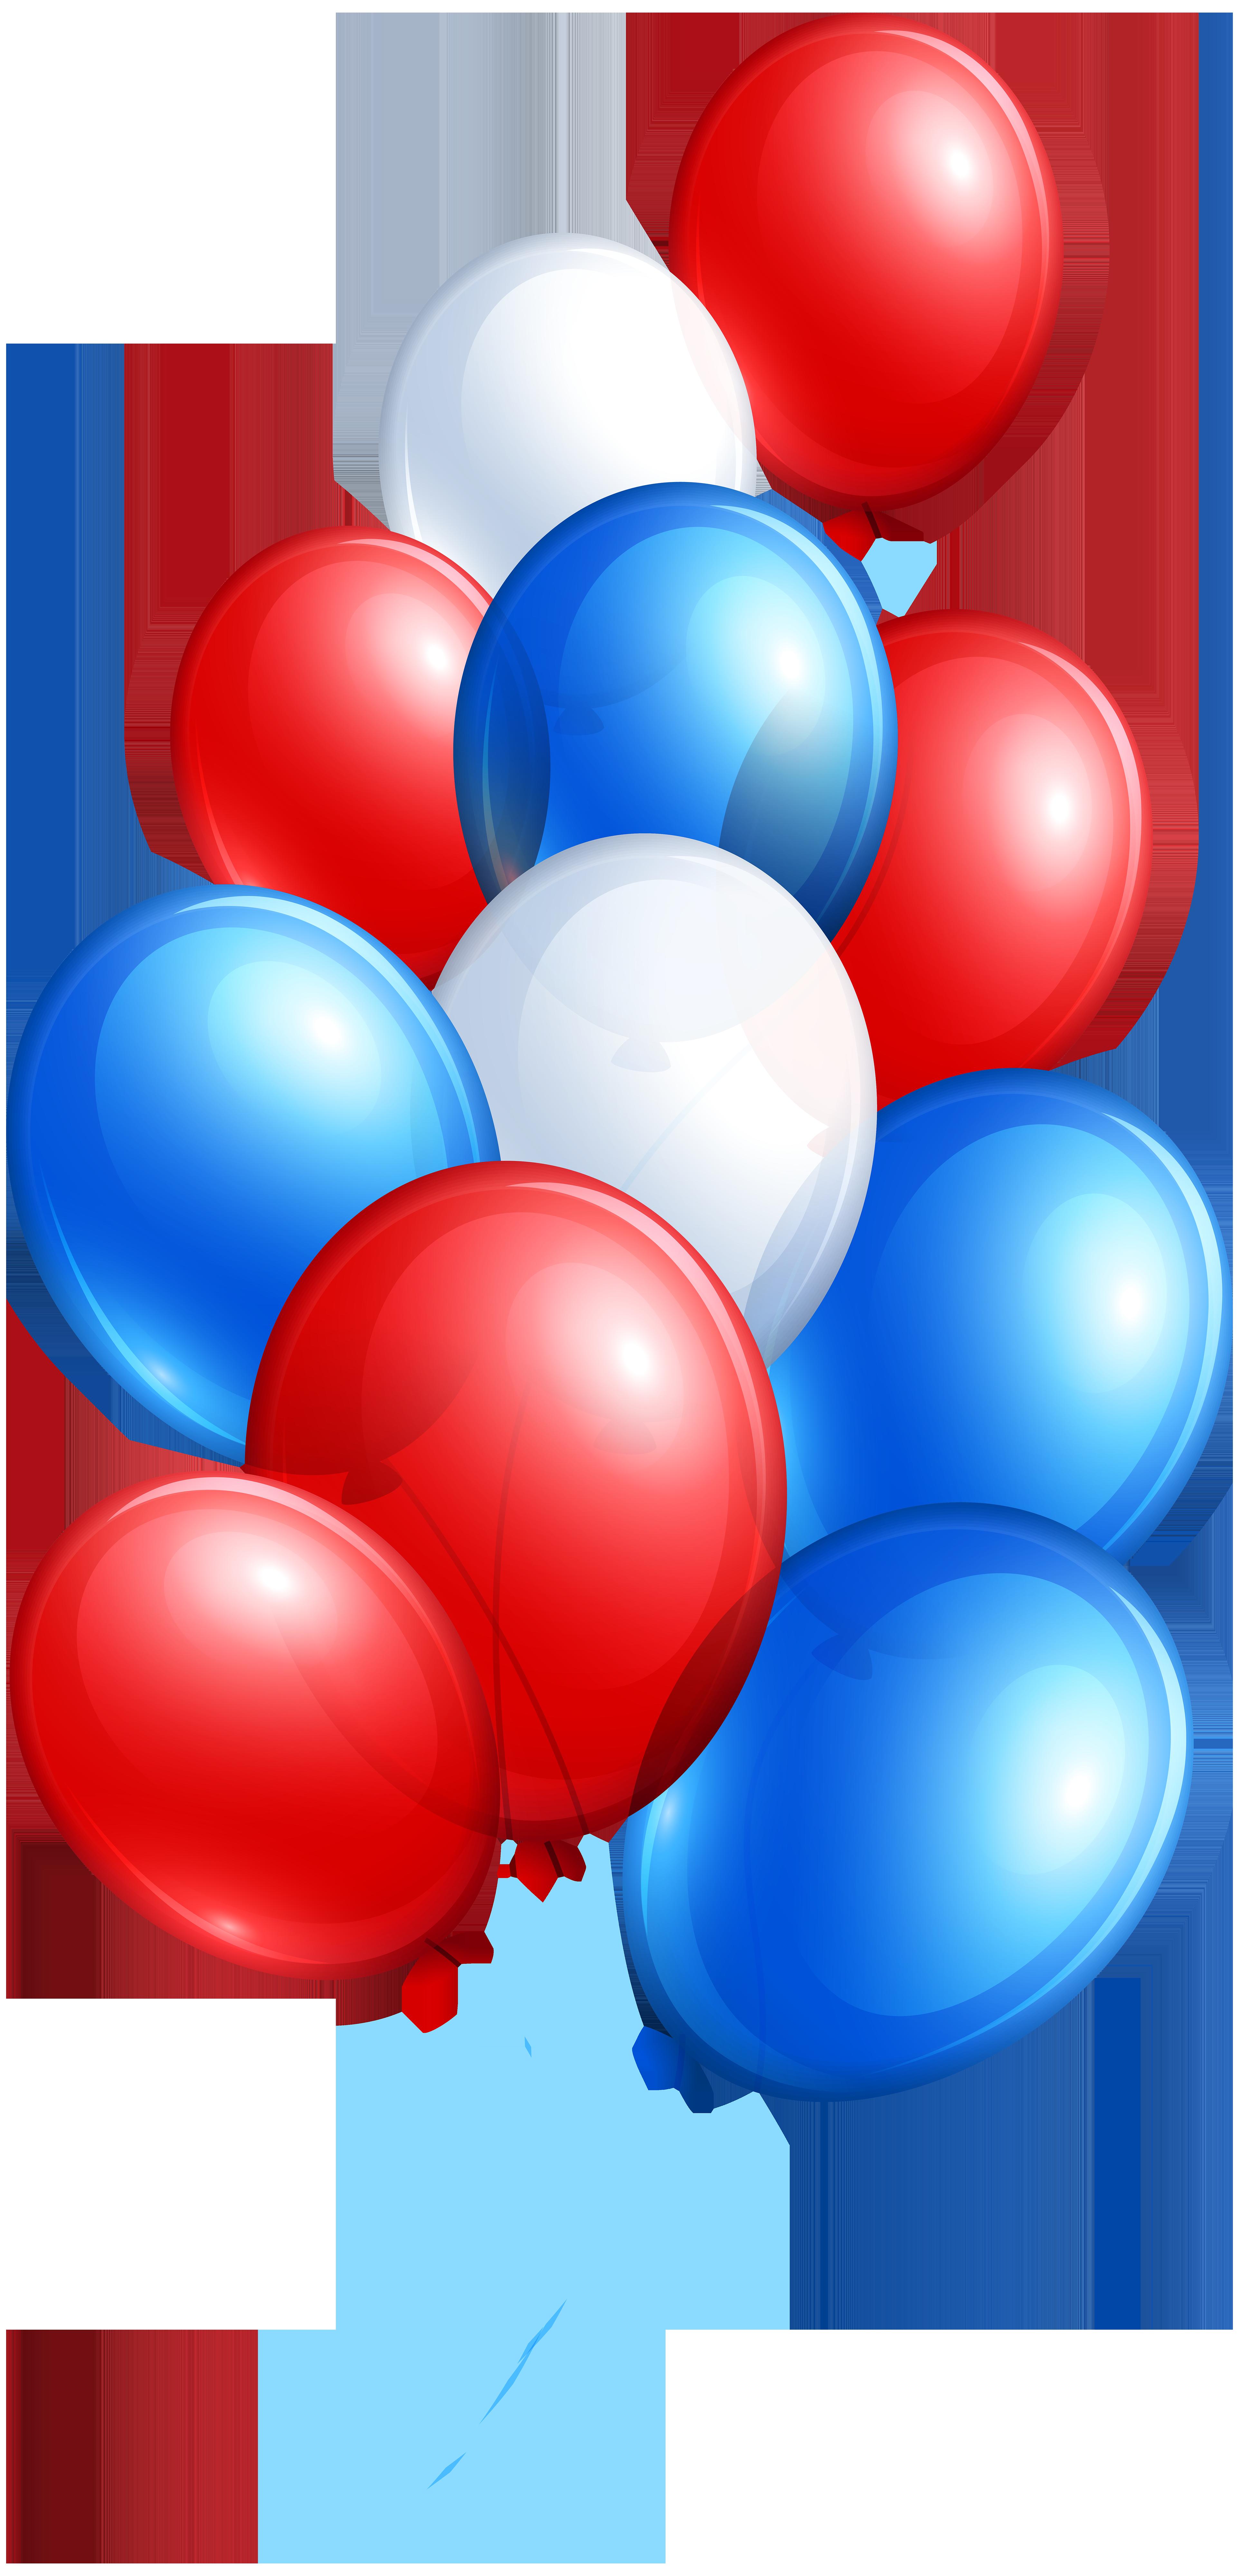 3848x8000 Balloon Clipart 4th July